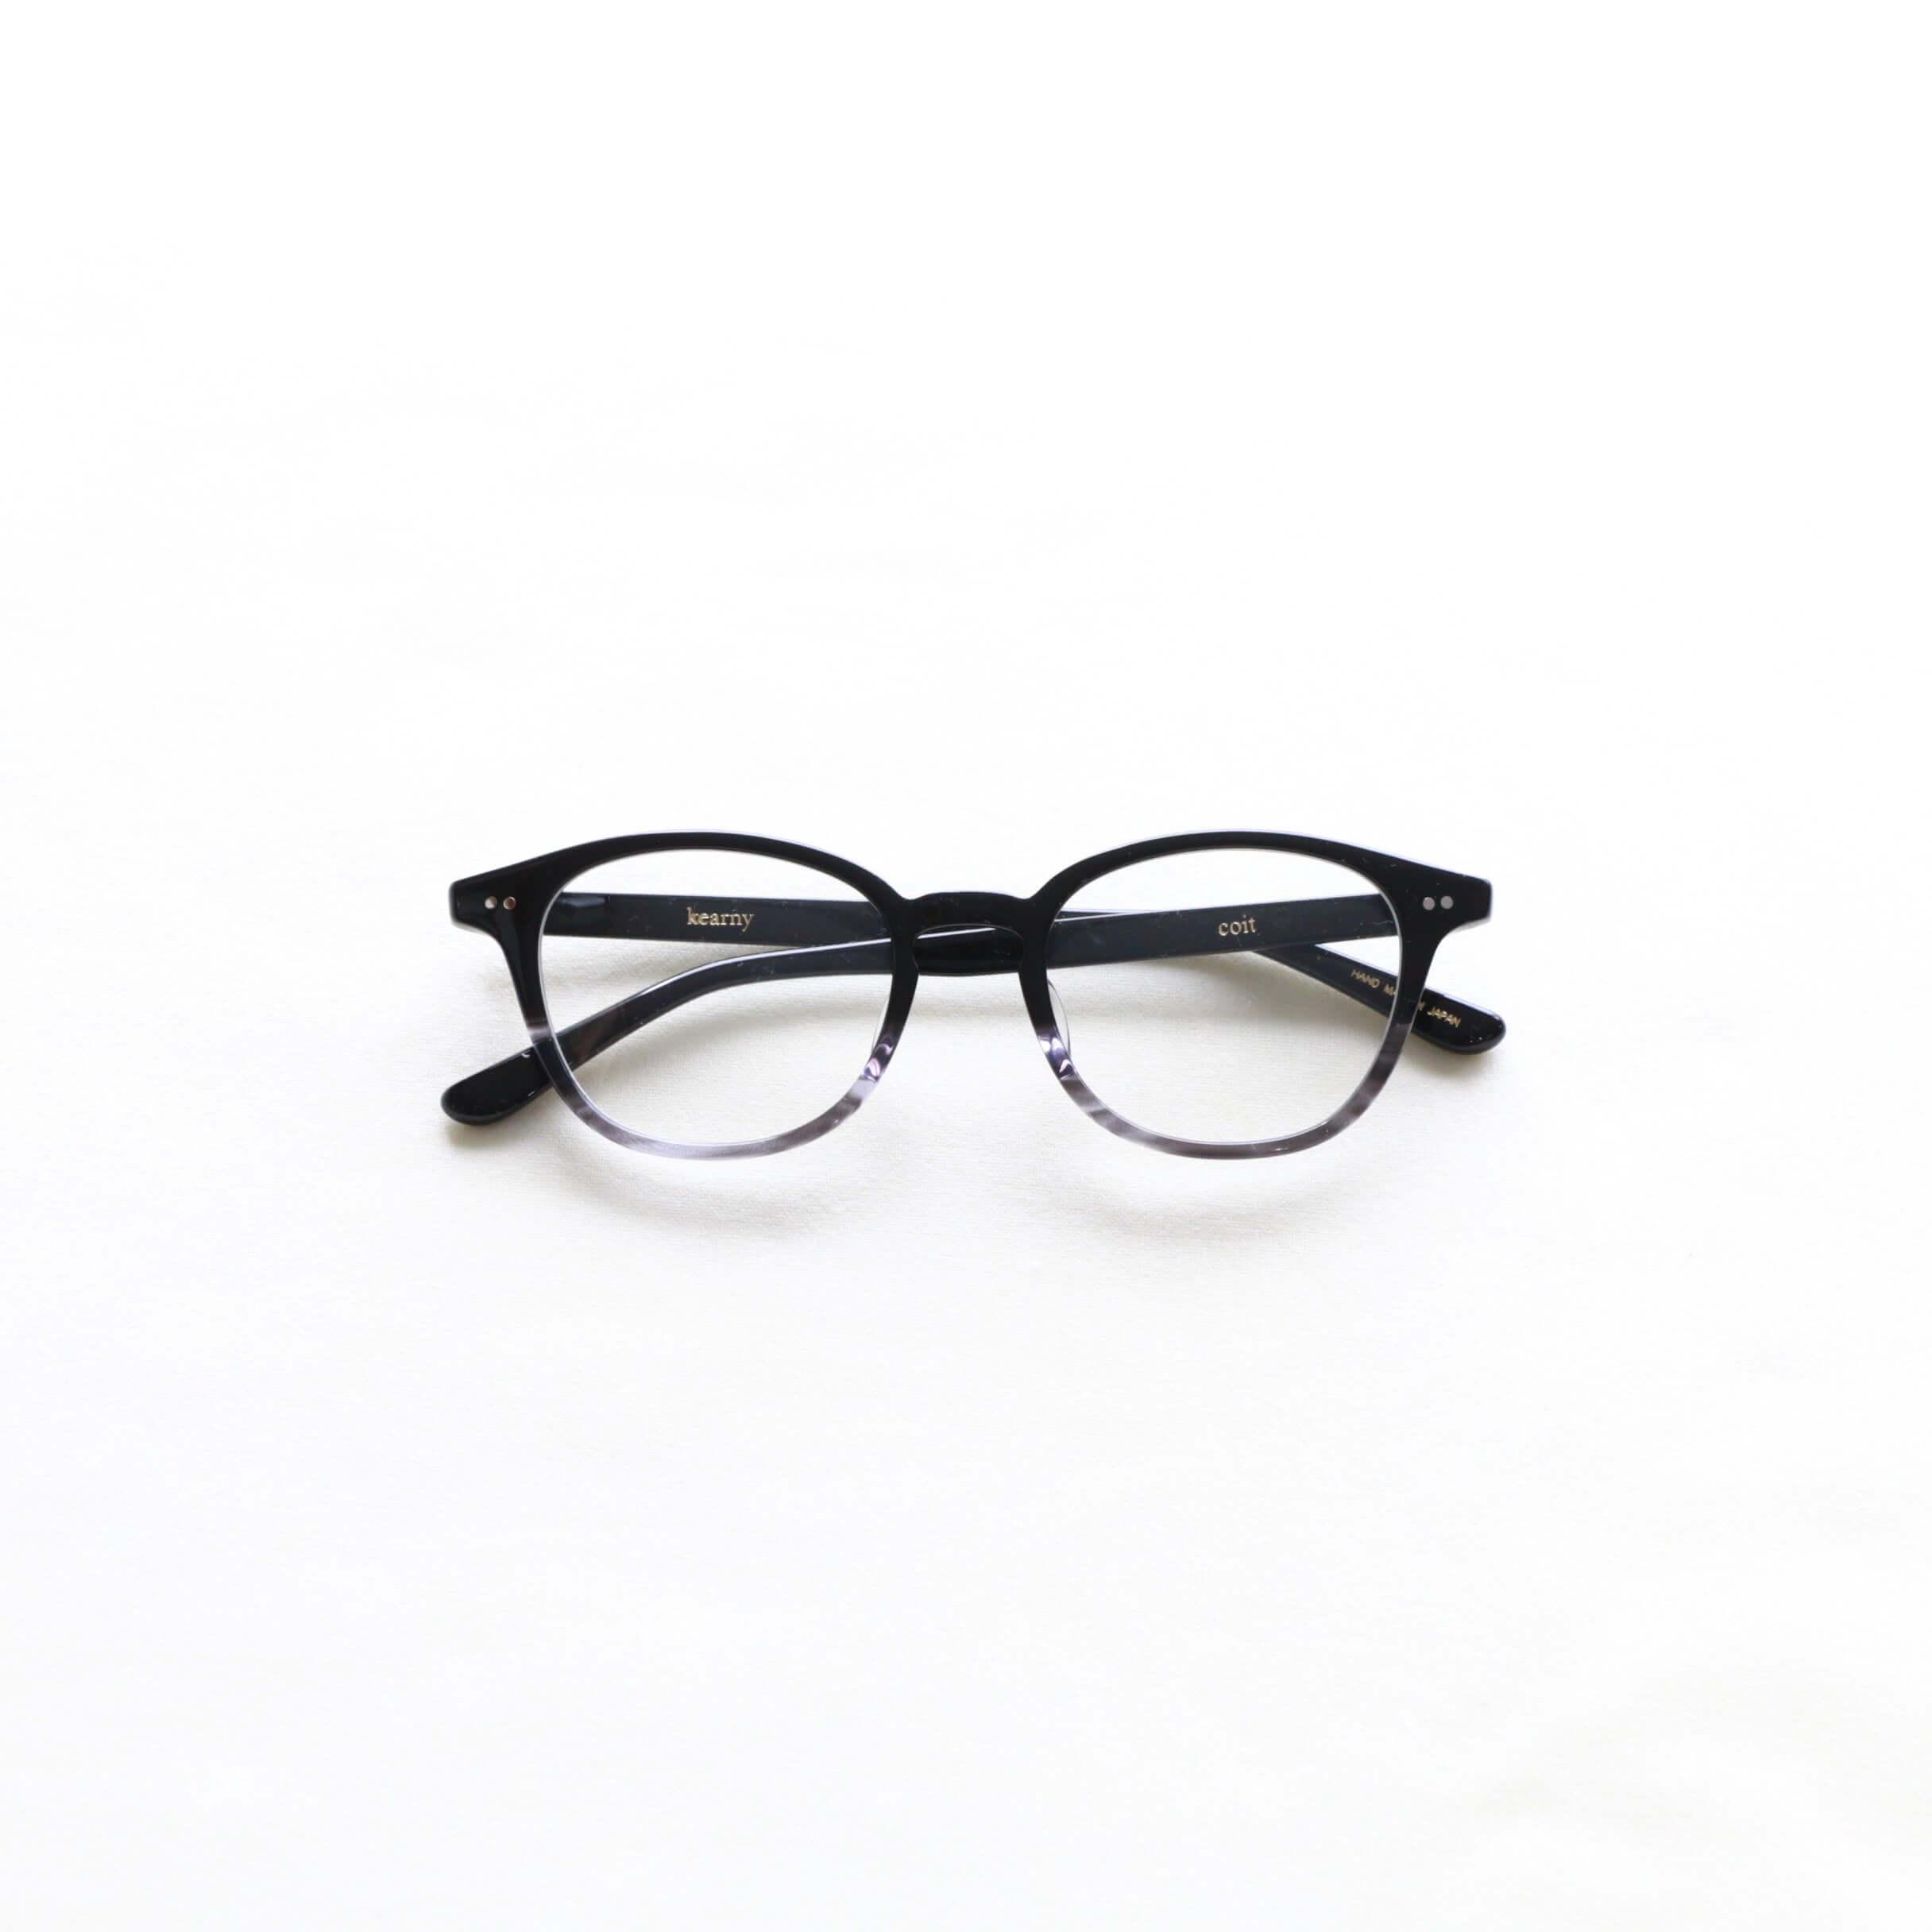 kearny カーニー coit コイト セルロイド眼鏡